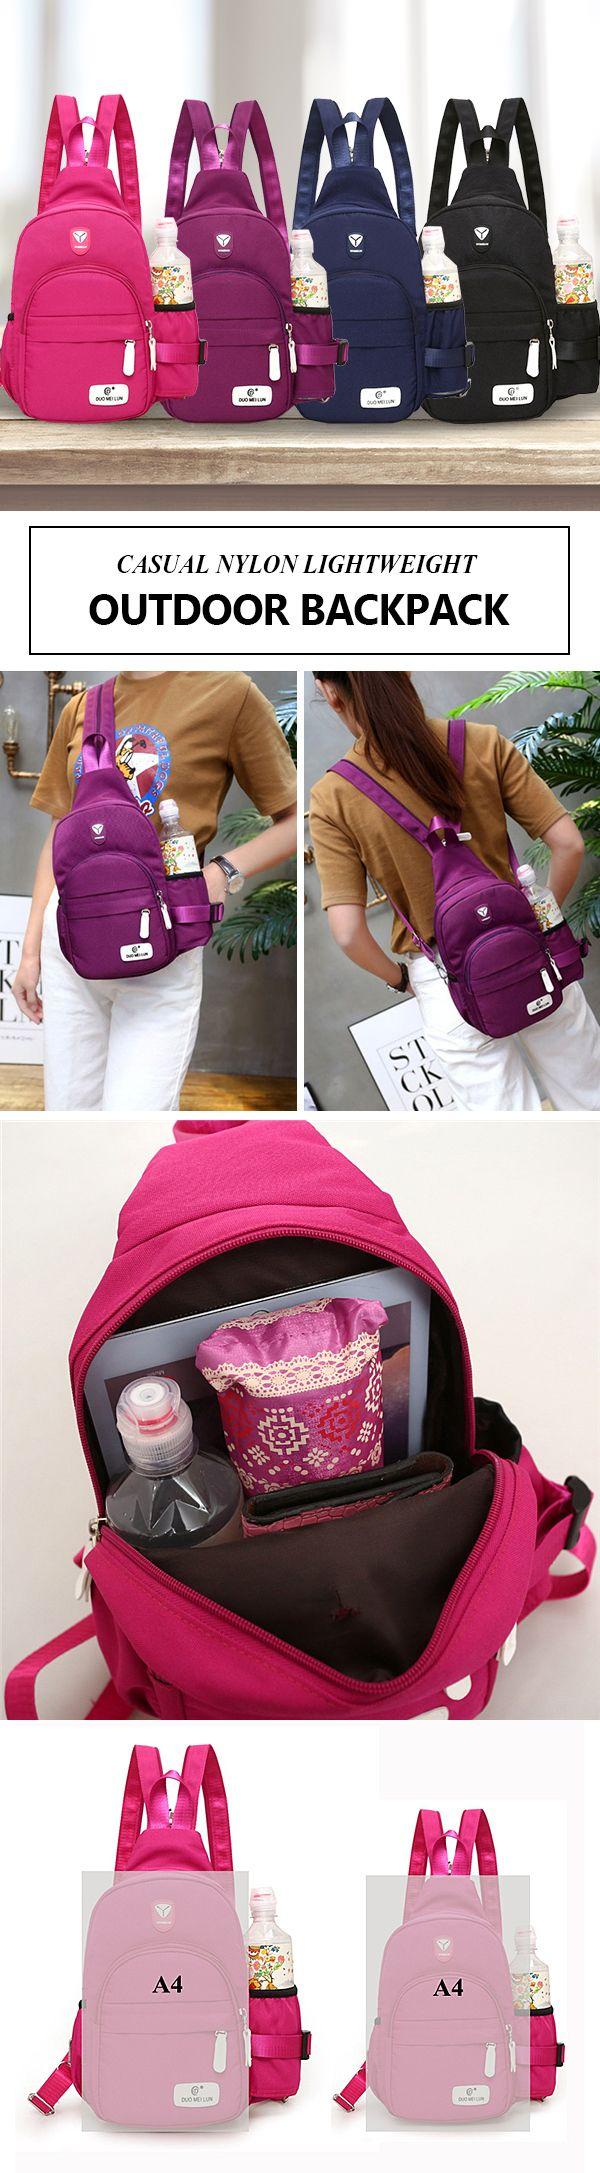 [$ 14.68 ~ 16.18] Casual Nylon Lightweight Outdoor Travel Chest Bag Shoulder Bag Backpack For Women